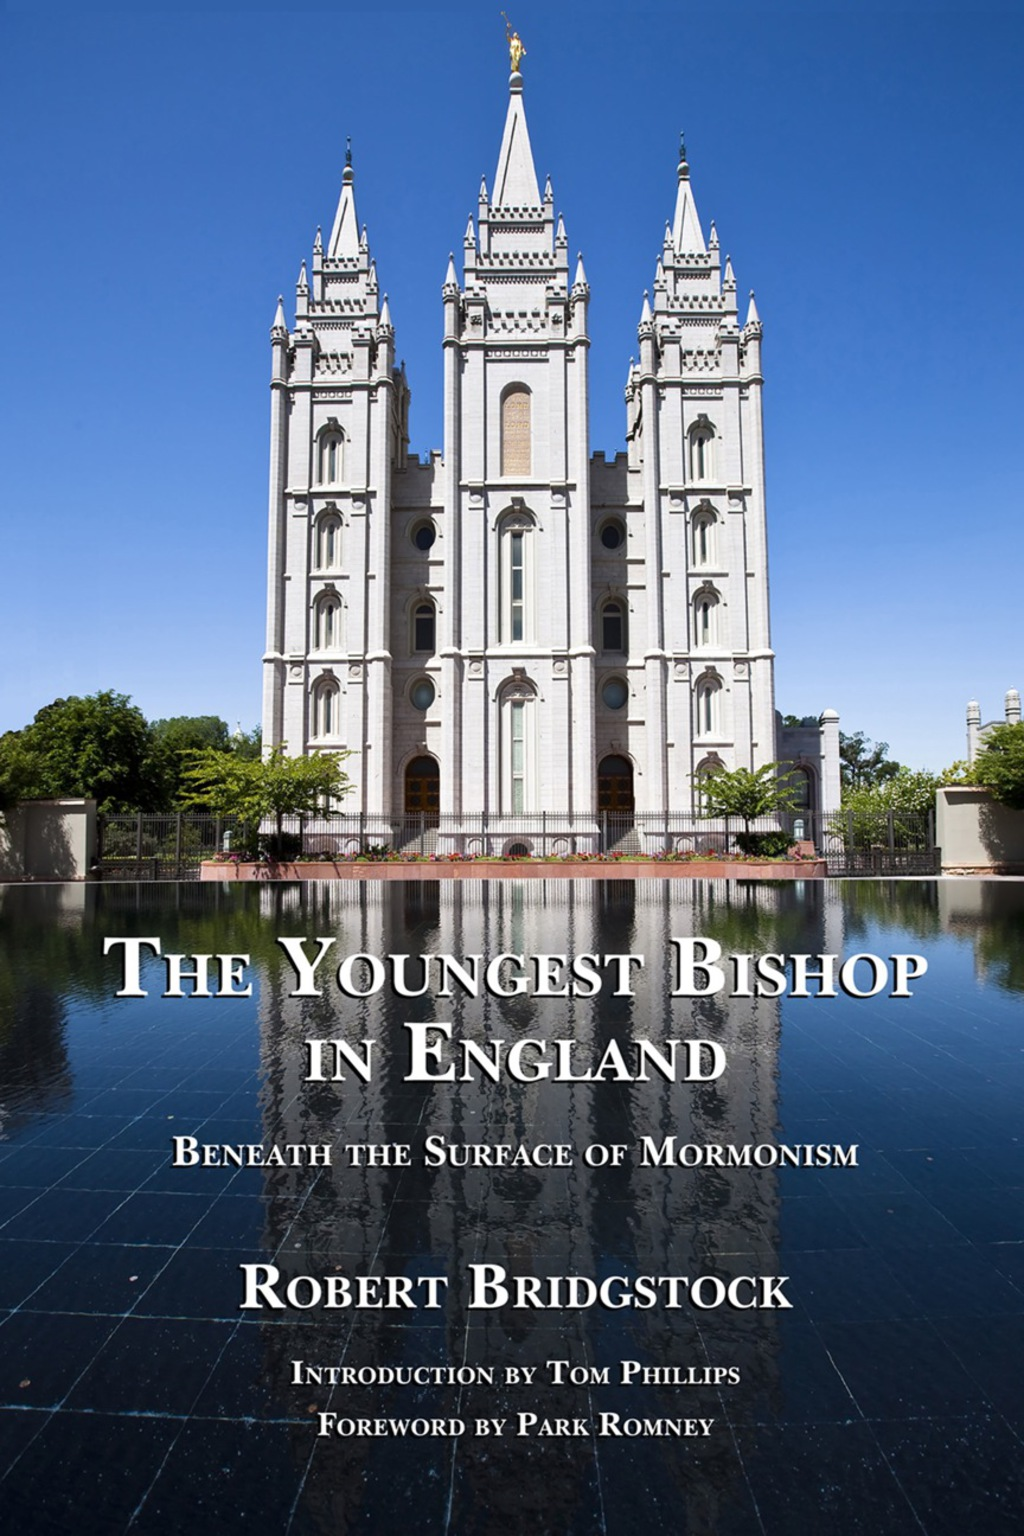 By Robert Bridgstock PRINTISBN: 9781937276034 E-TEXT ISBN: 9781937276652 Edition: 1